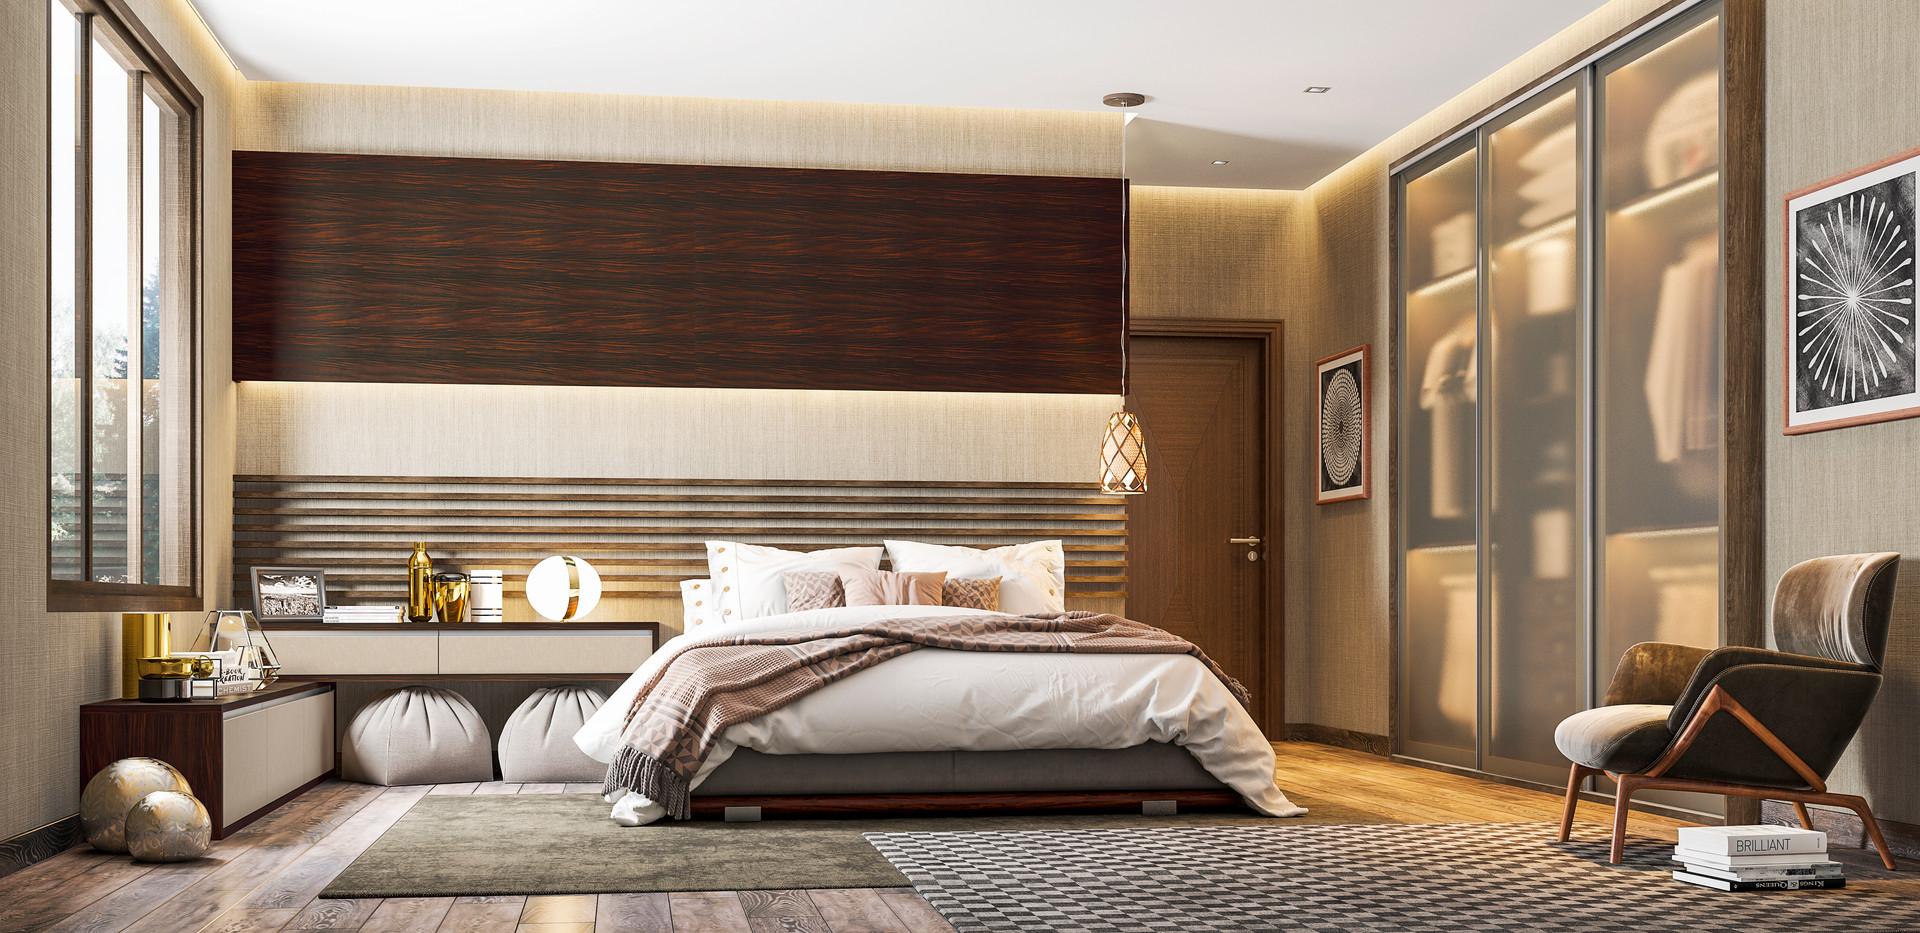 Dormitório_03_-_Carvalho_Nogal_Eco__-_Ja